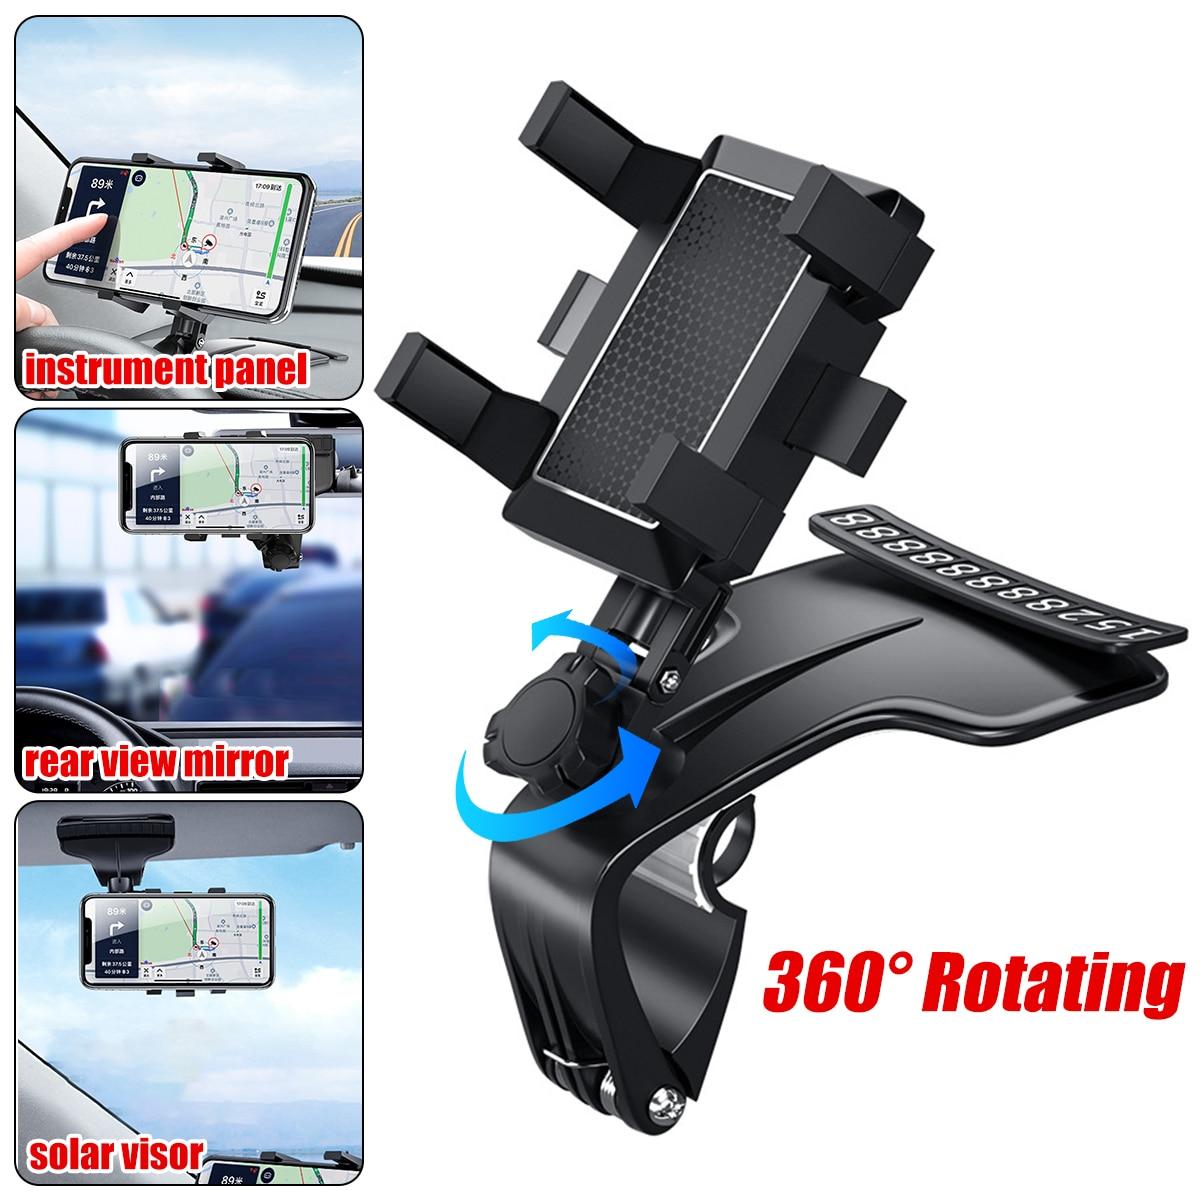 Car Multifunctional Mobile Phone Bracket 360 Degree Sun Visor Mirror Dashboard Mount GPS Stand Phone Holder With Parking Card 1